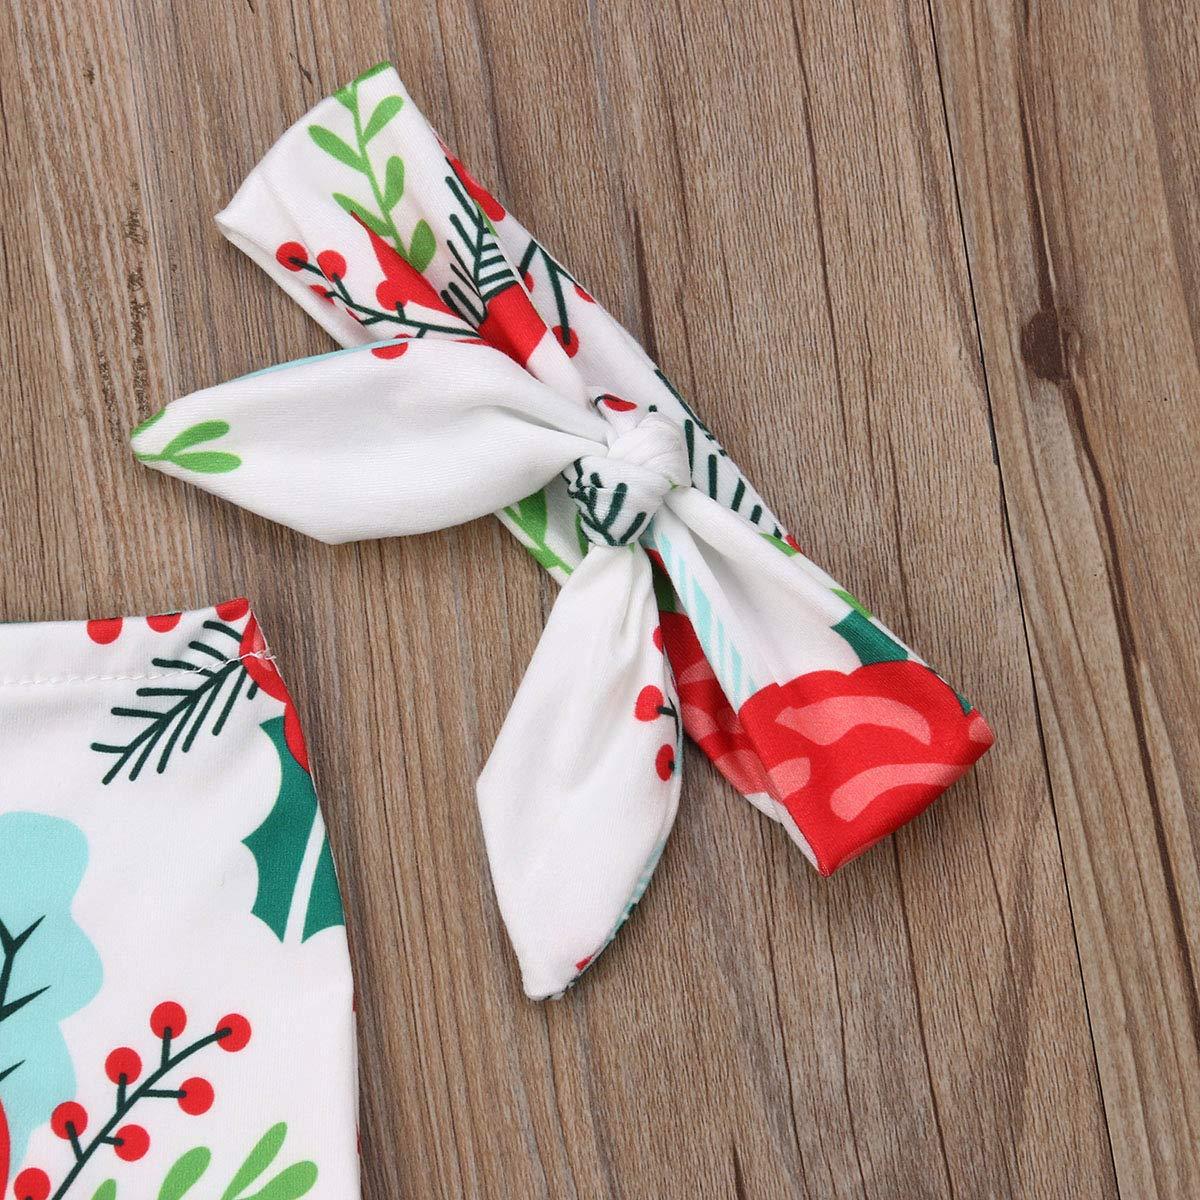 Baby Boy Girls Flower Gown Swaddle Sleeping Bag Reveiving Blanket Sleepers with Headband 0-3Months